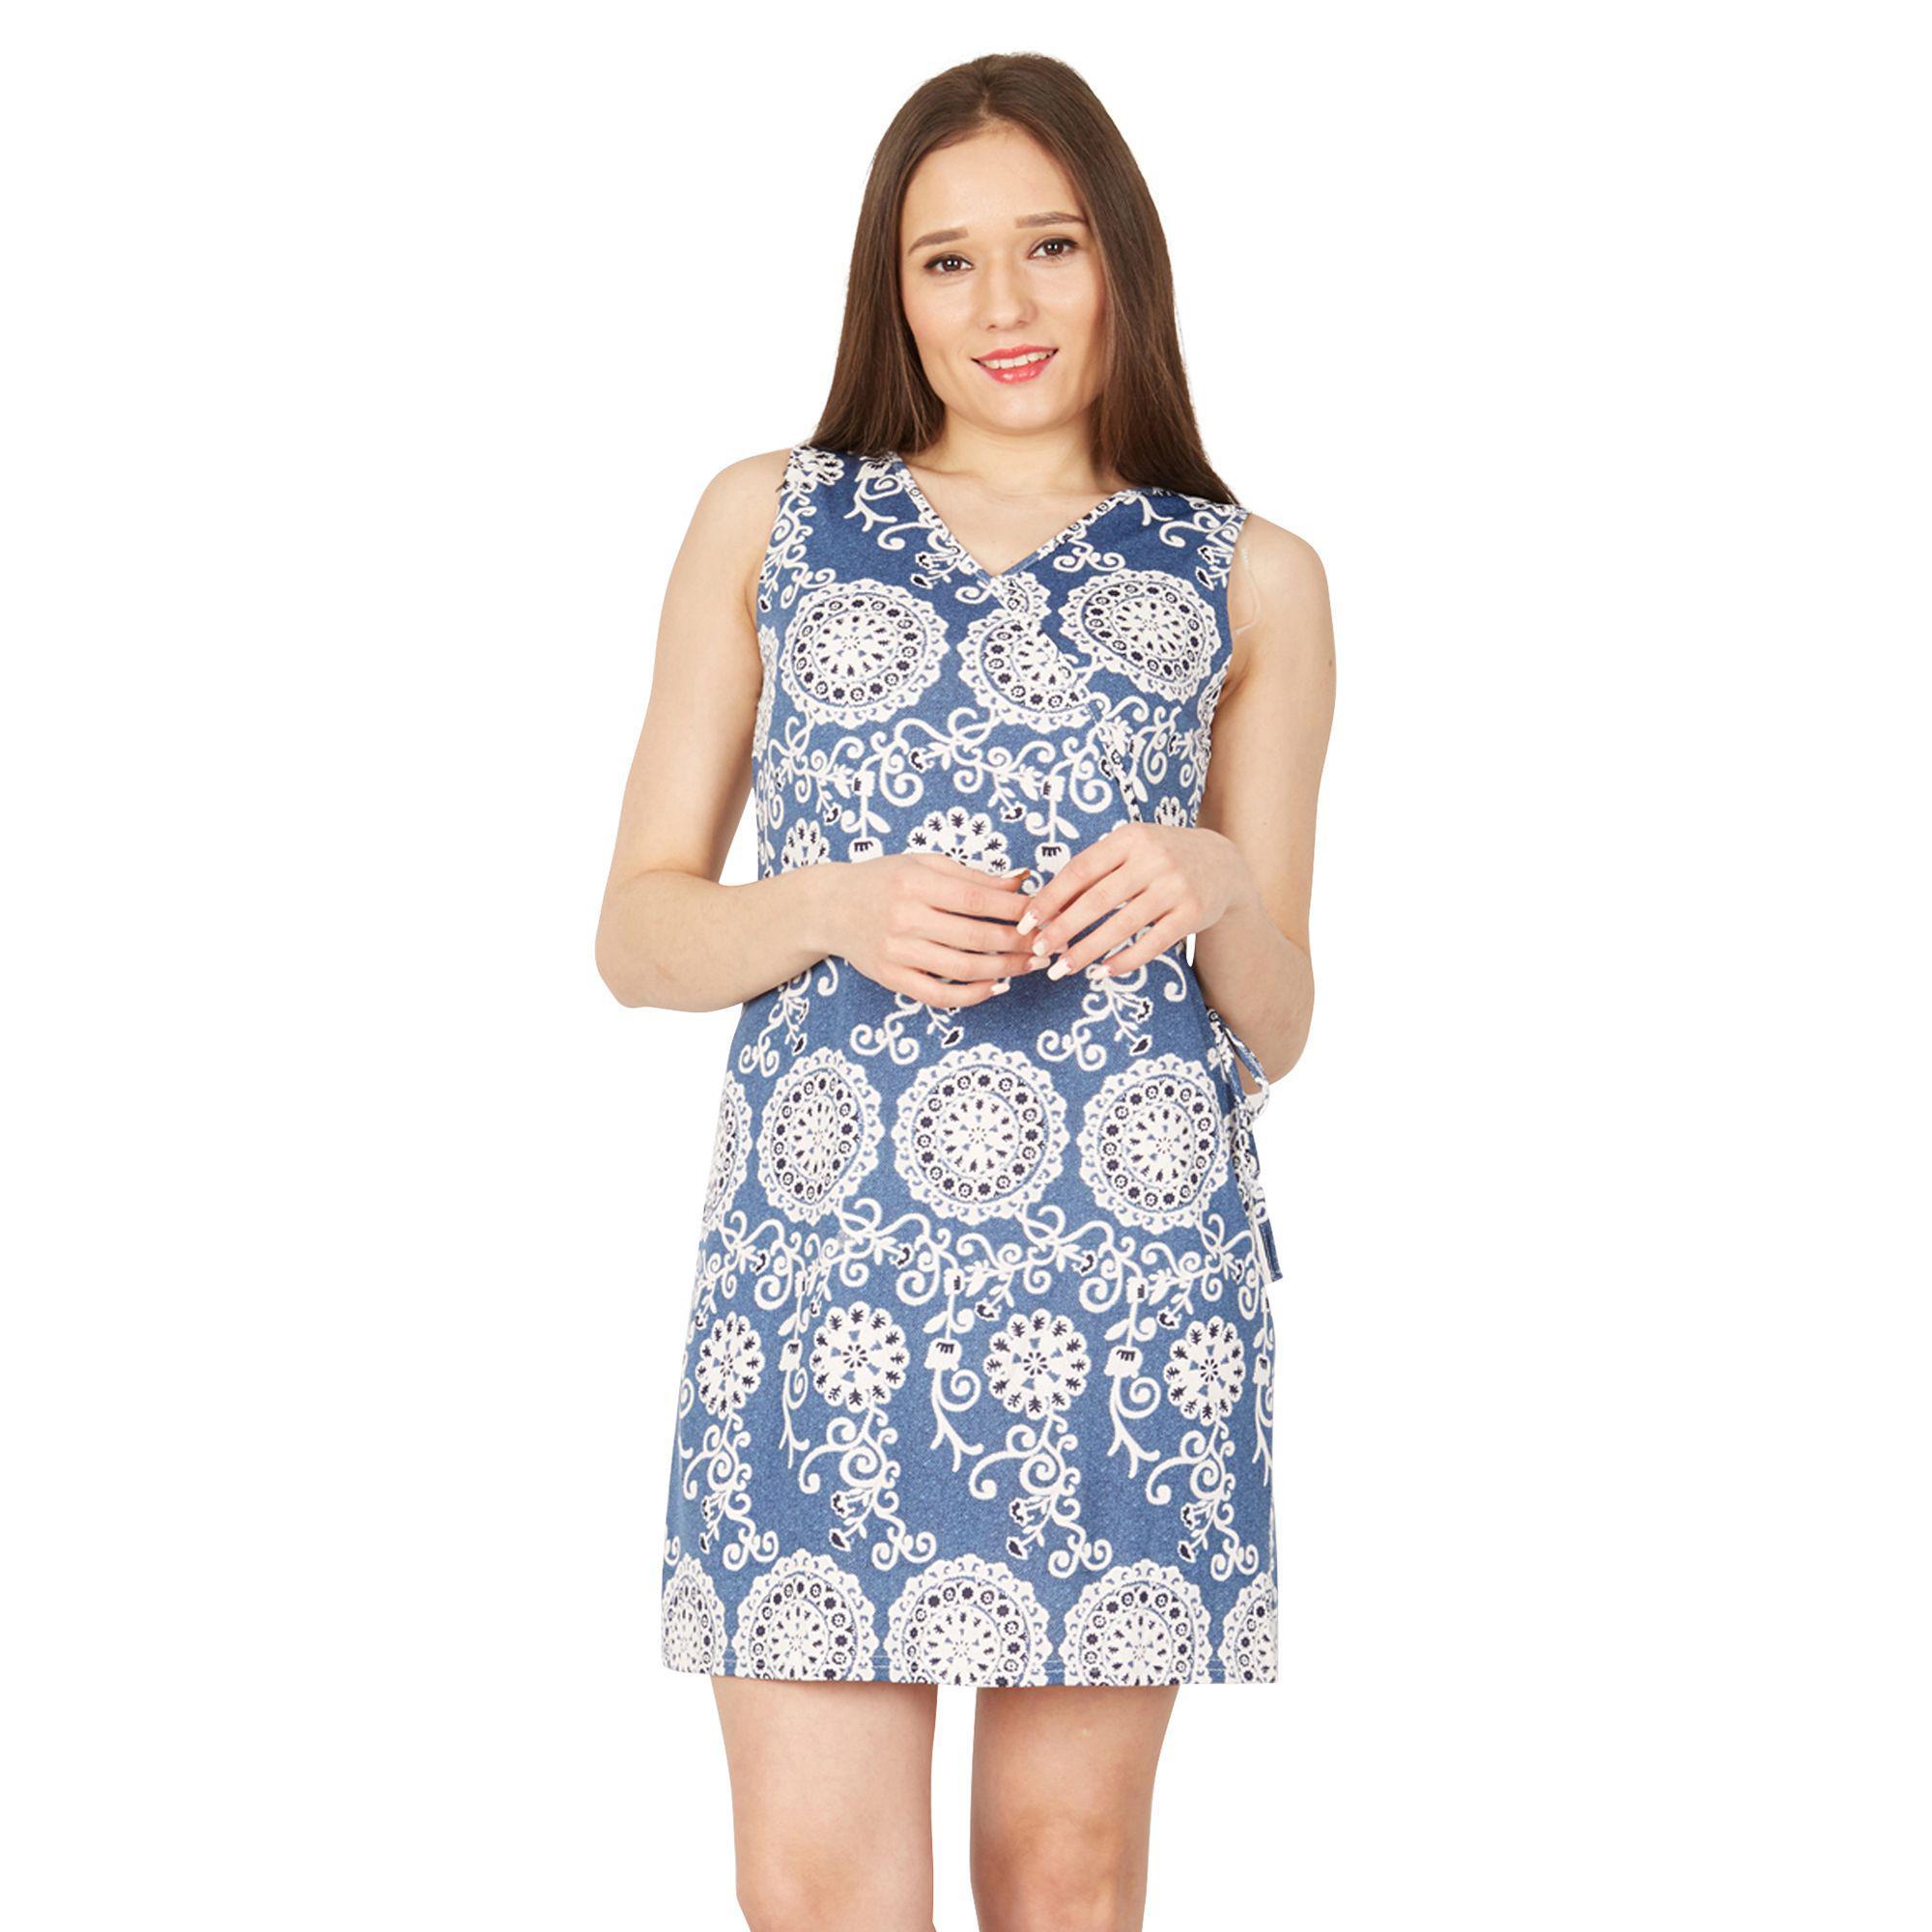 60bdd3c1815f Izabel London Blue Psychedelic Print Shift Dress in Blue - Lyst